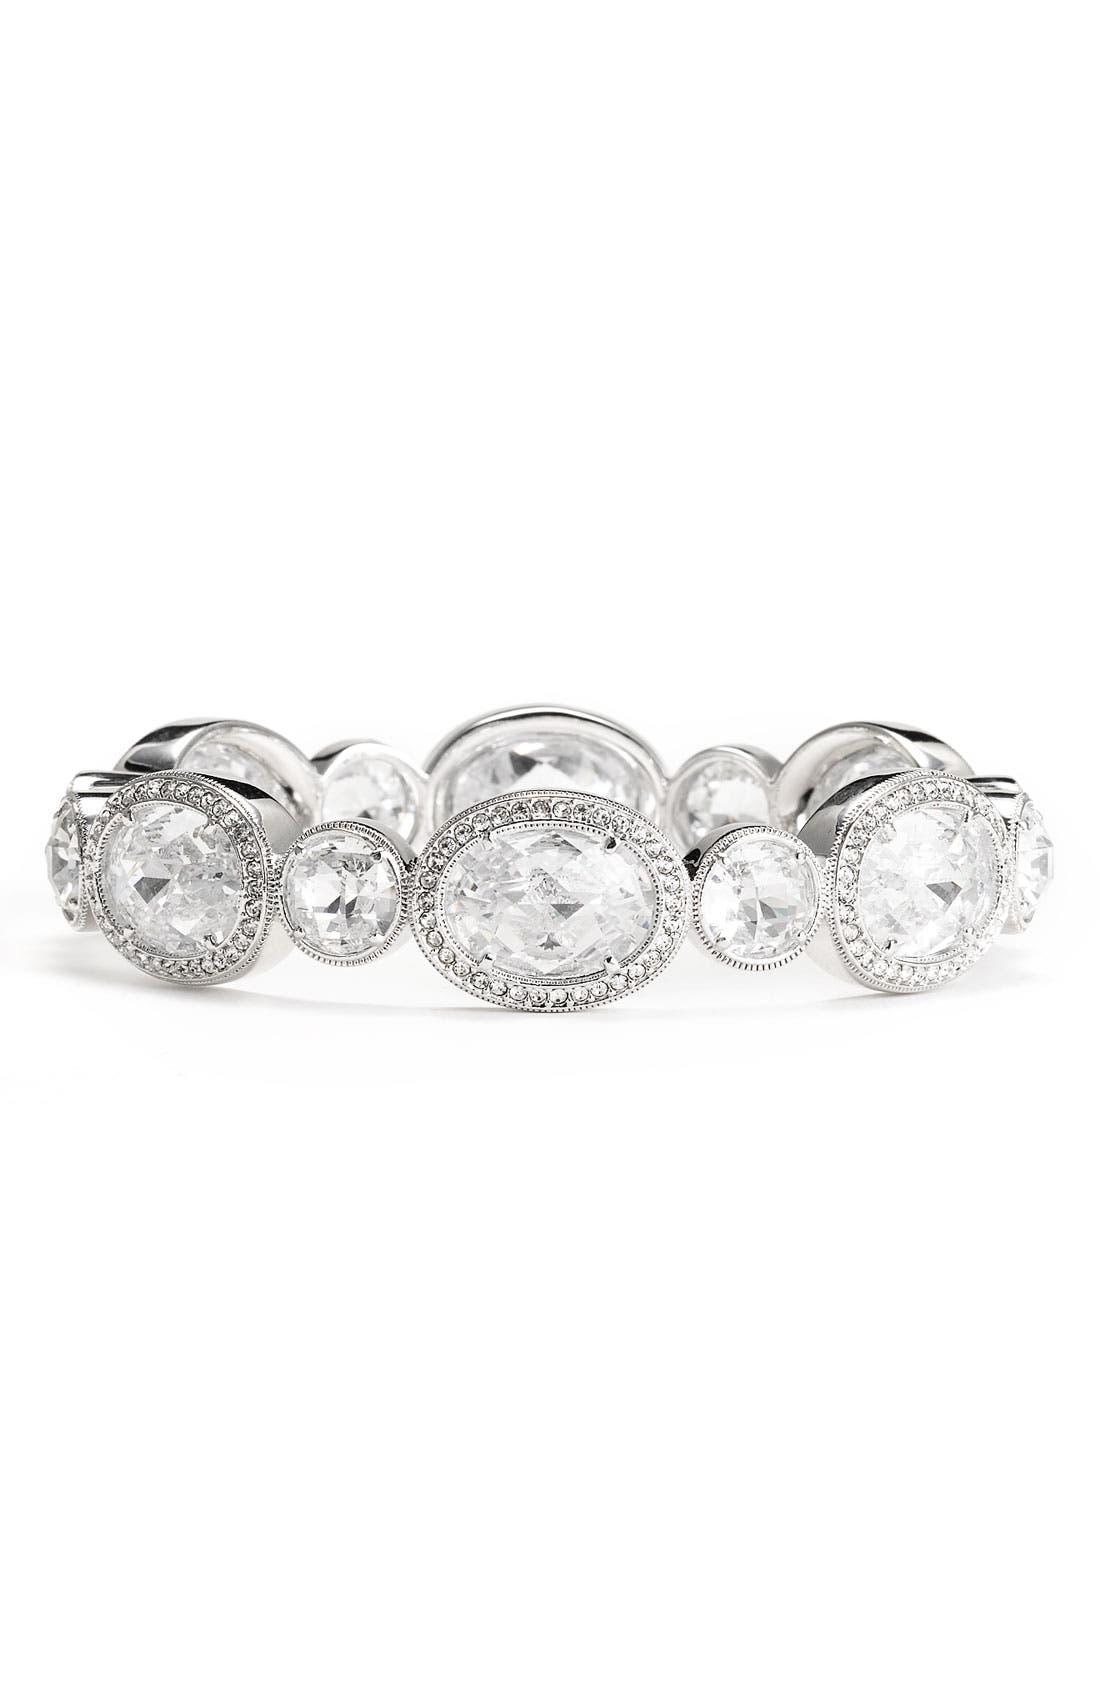 Alternate Image 1 Selected - Nadri Crystal & Cubic Zirconia Hinged Bangle